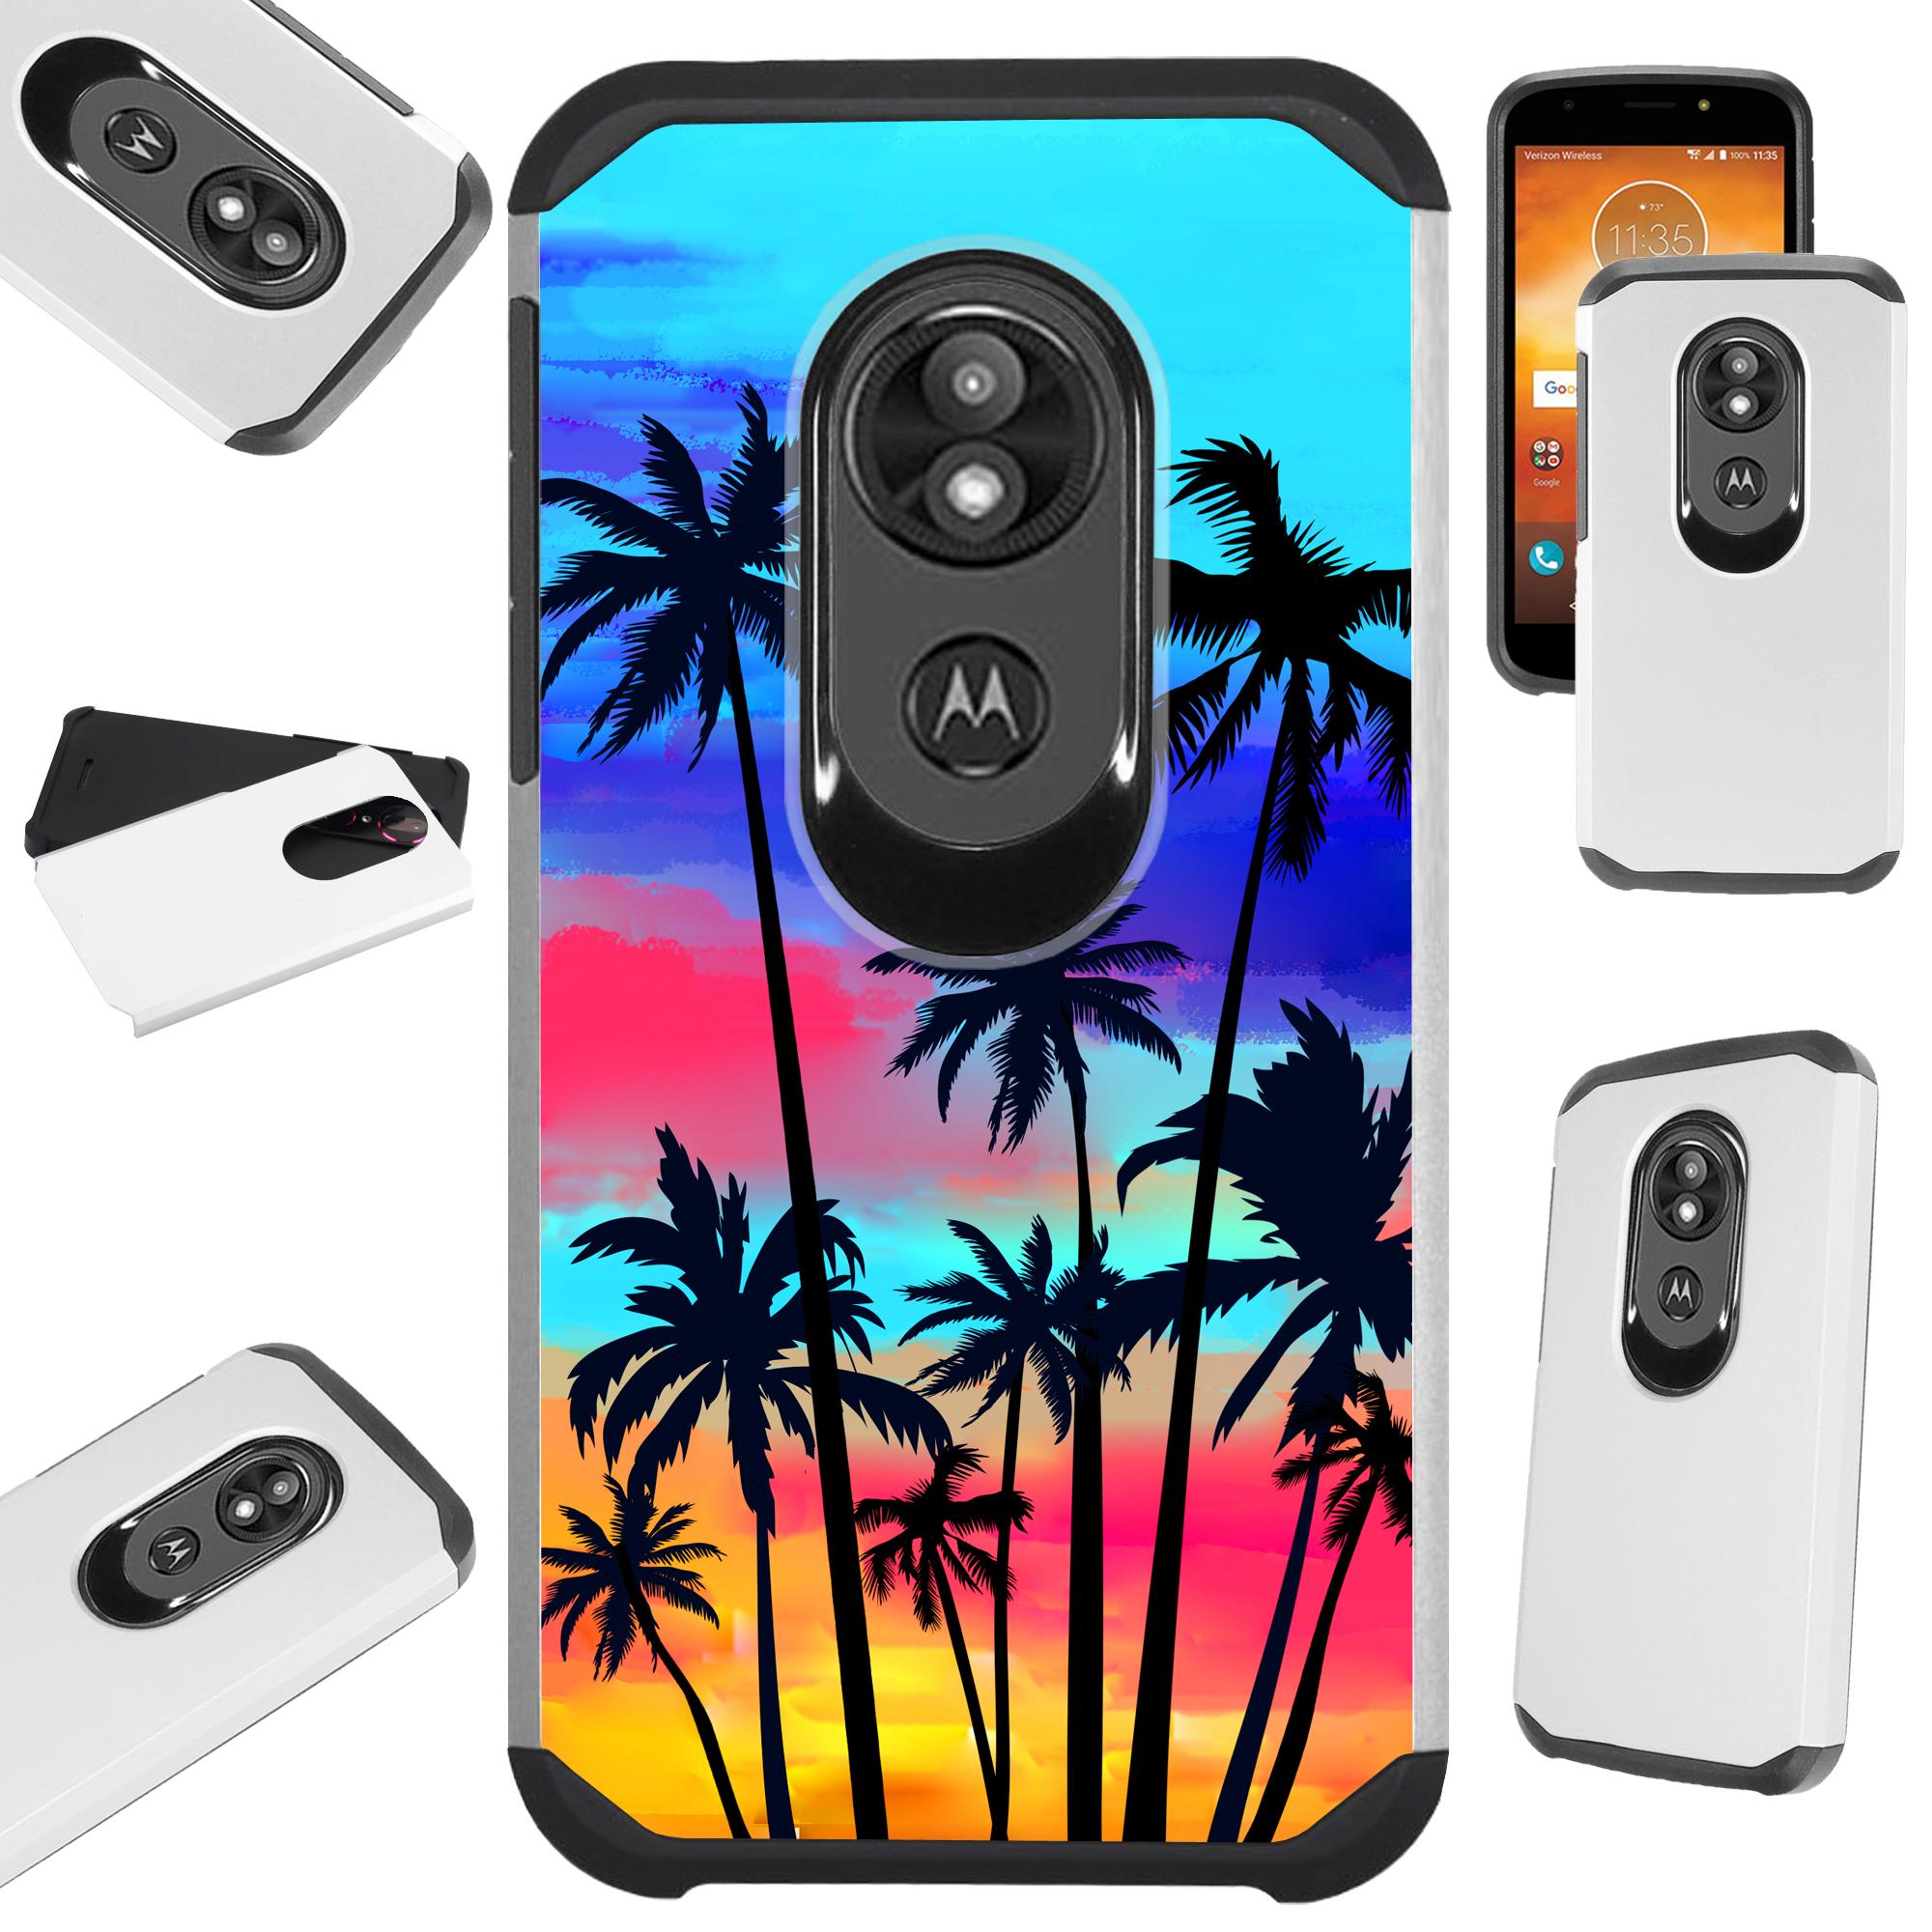 For Motorola Moto G6 Play | Moto G6 Forge Case Hybrid TPU Fusion Phone Cover (Sunset Palm Tree)